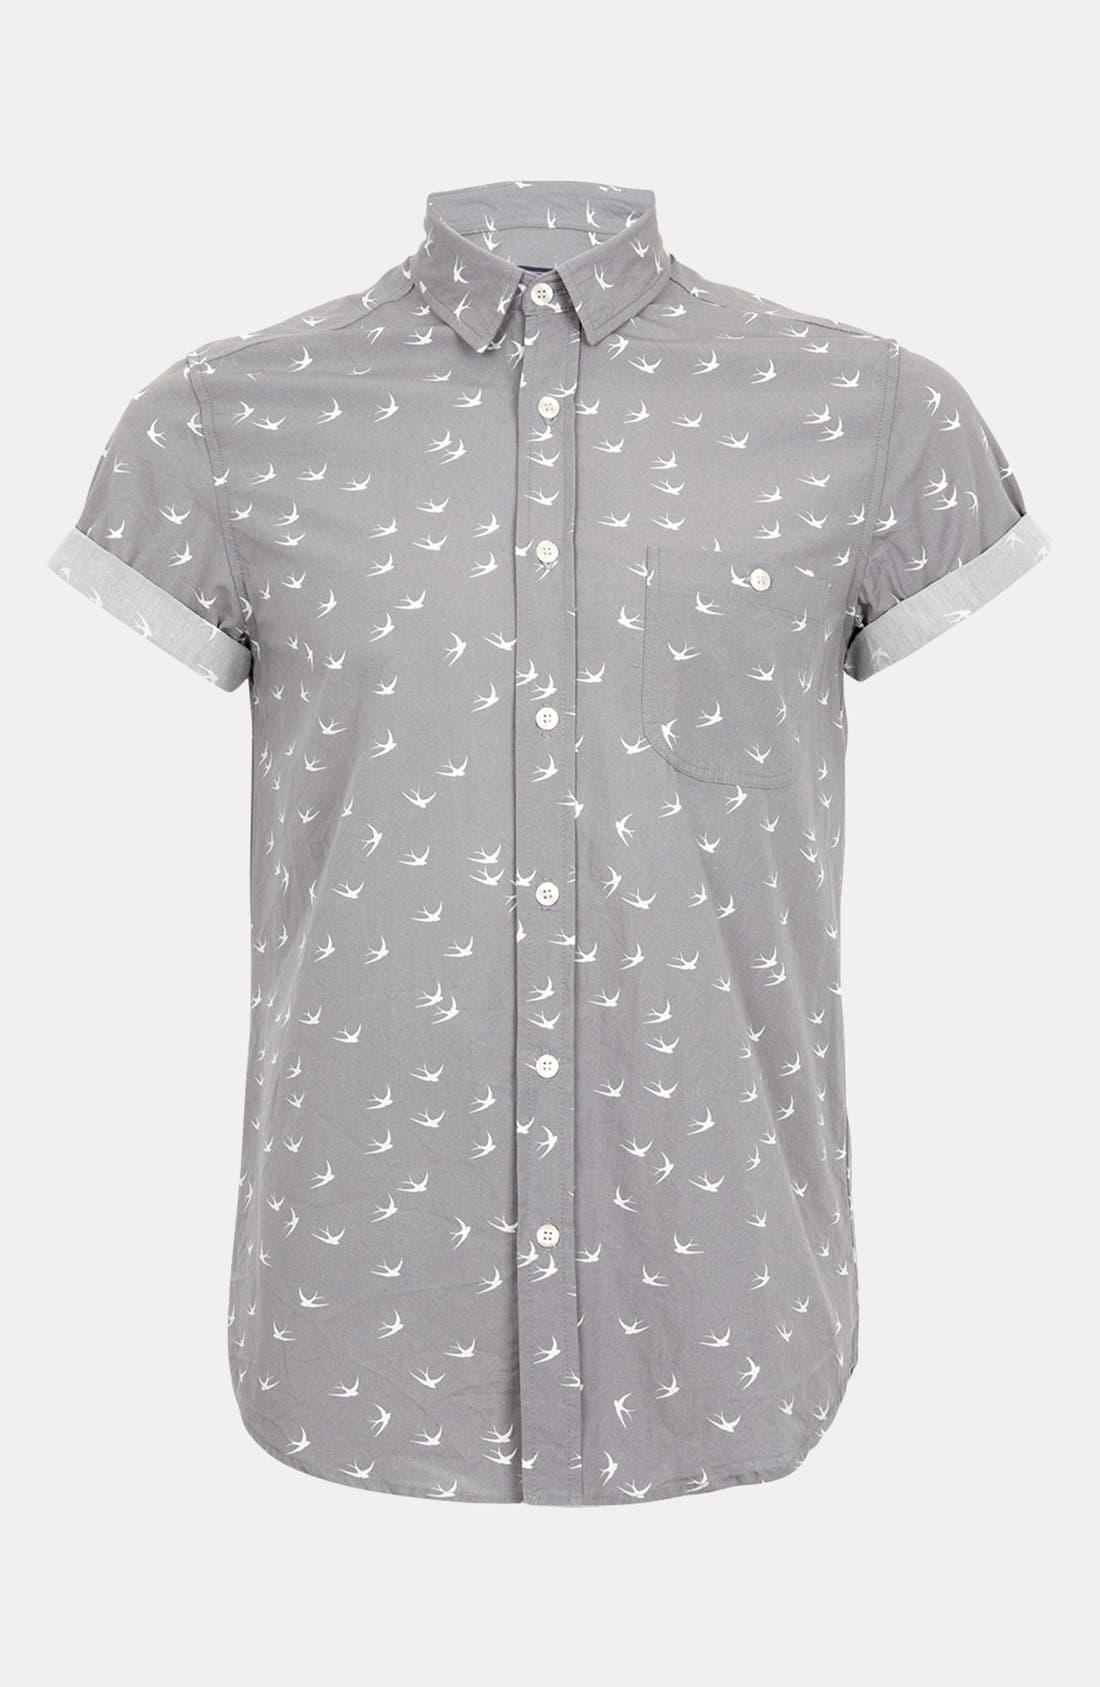 Main Image - Topman 'High Roller' Swallow Print Shirt